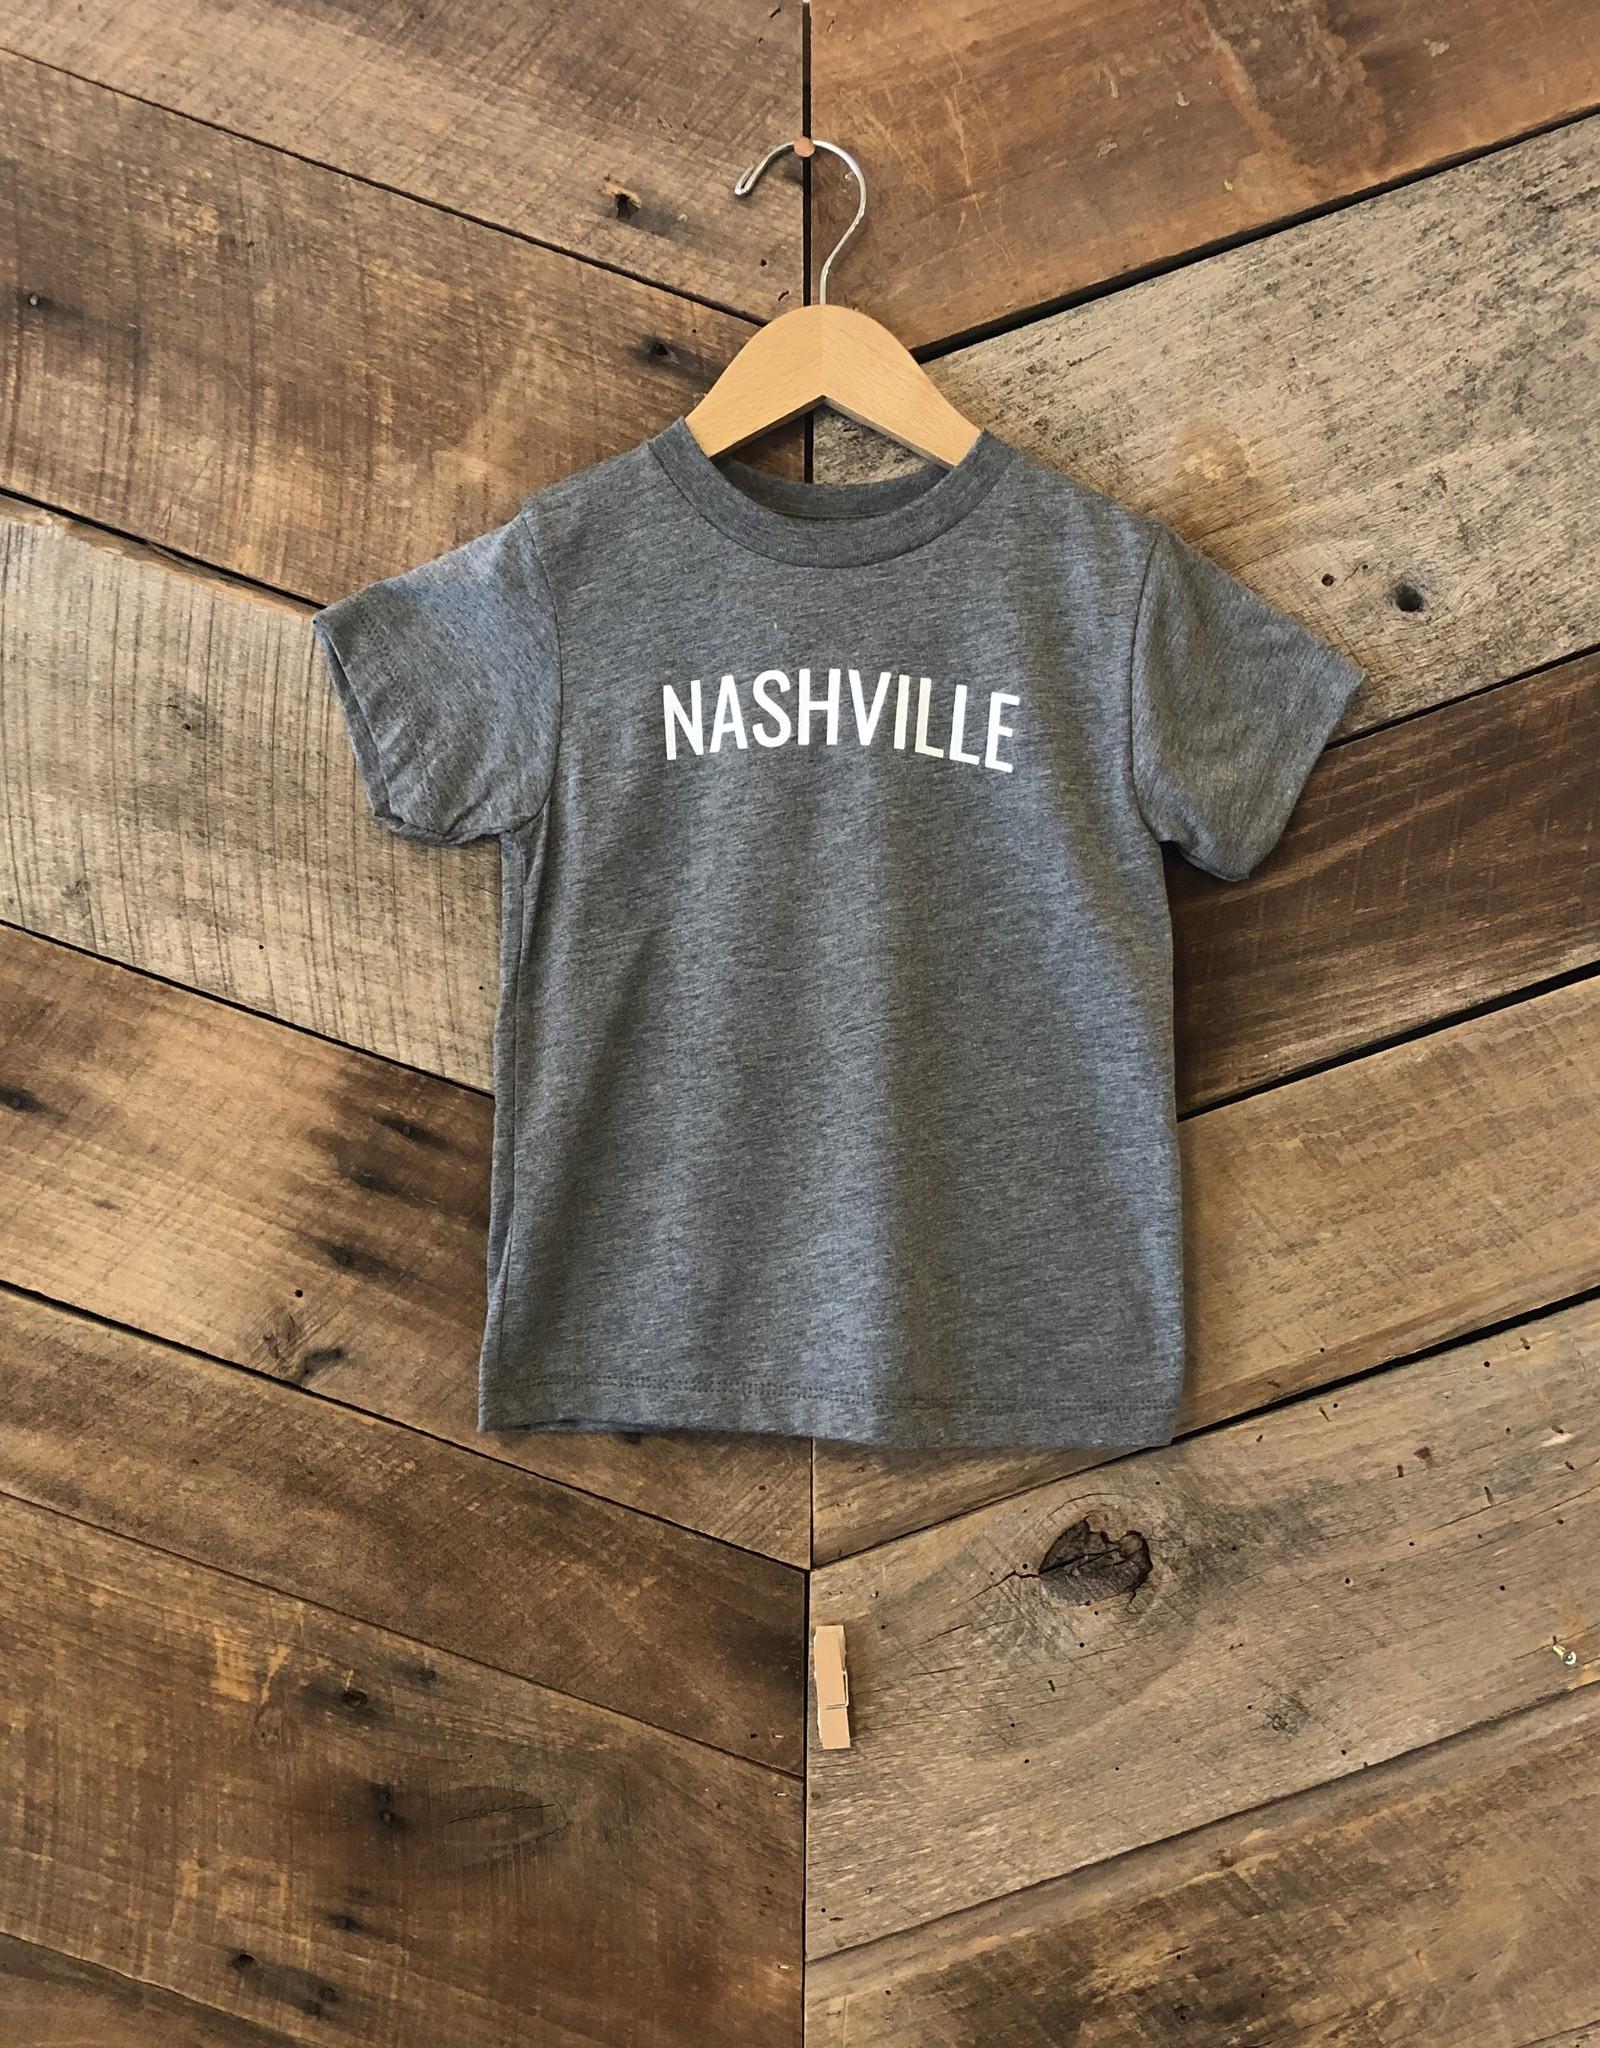 Grey Triblend Nashville Toddler Tee